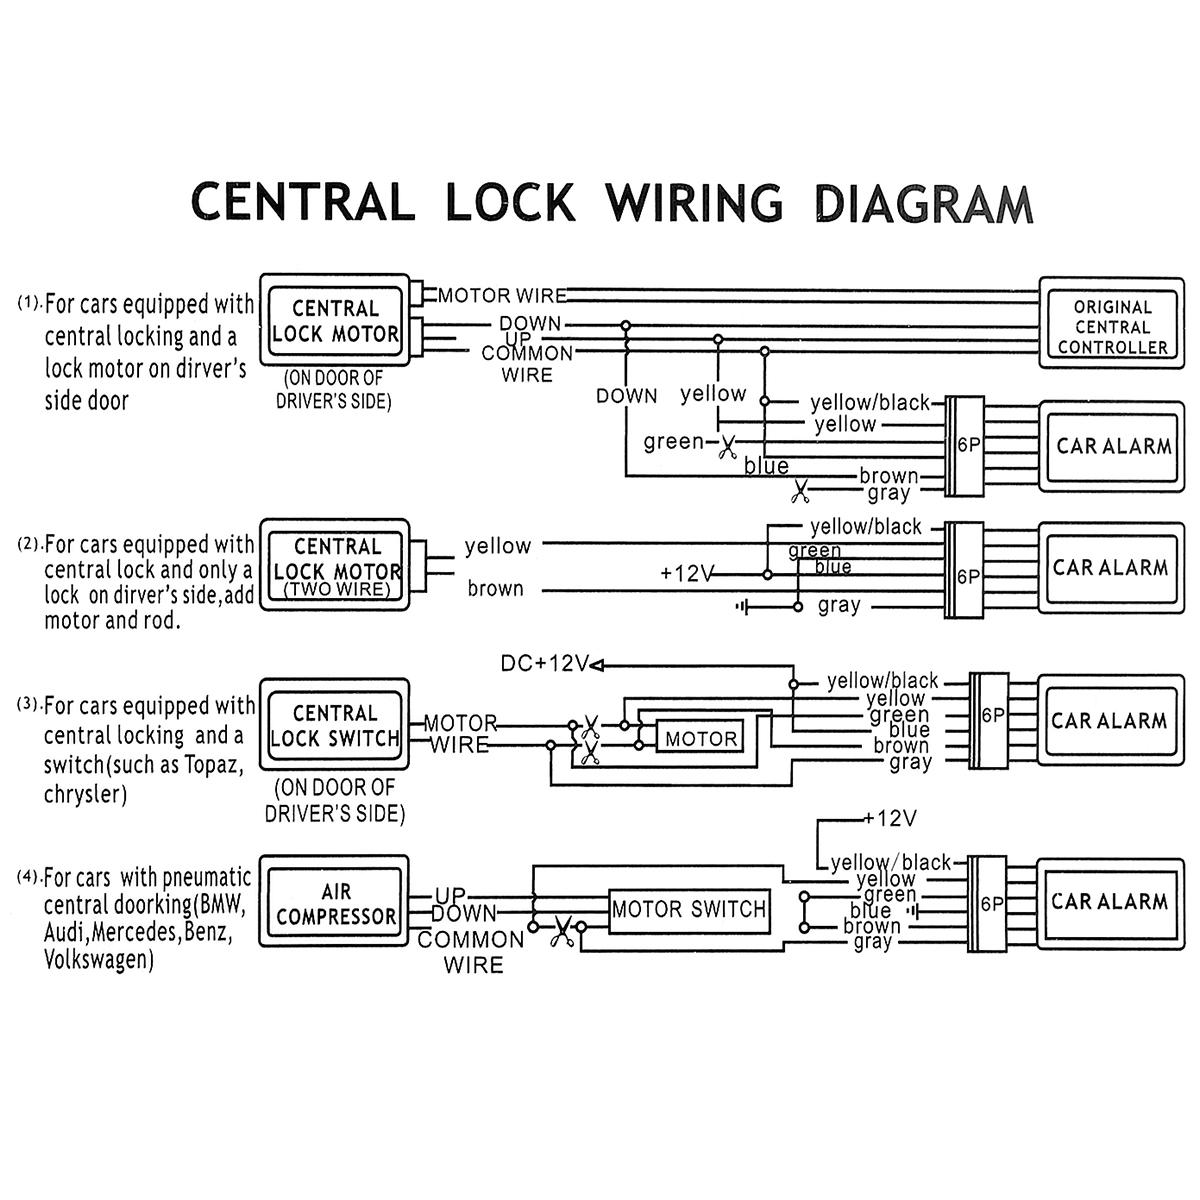 toyota alarm installation wiring diagrams th 8990  toyota alarm system wirering diagram  toyota alarm system wirering diagram